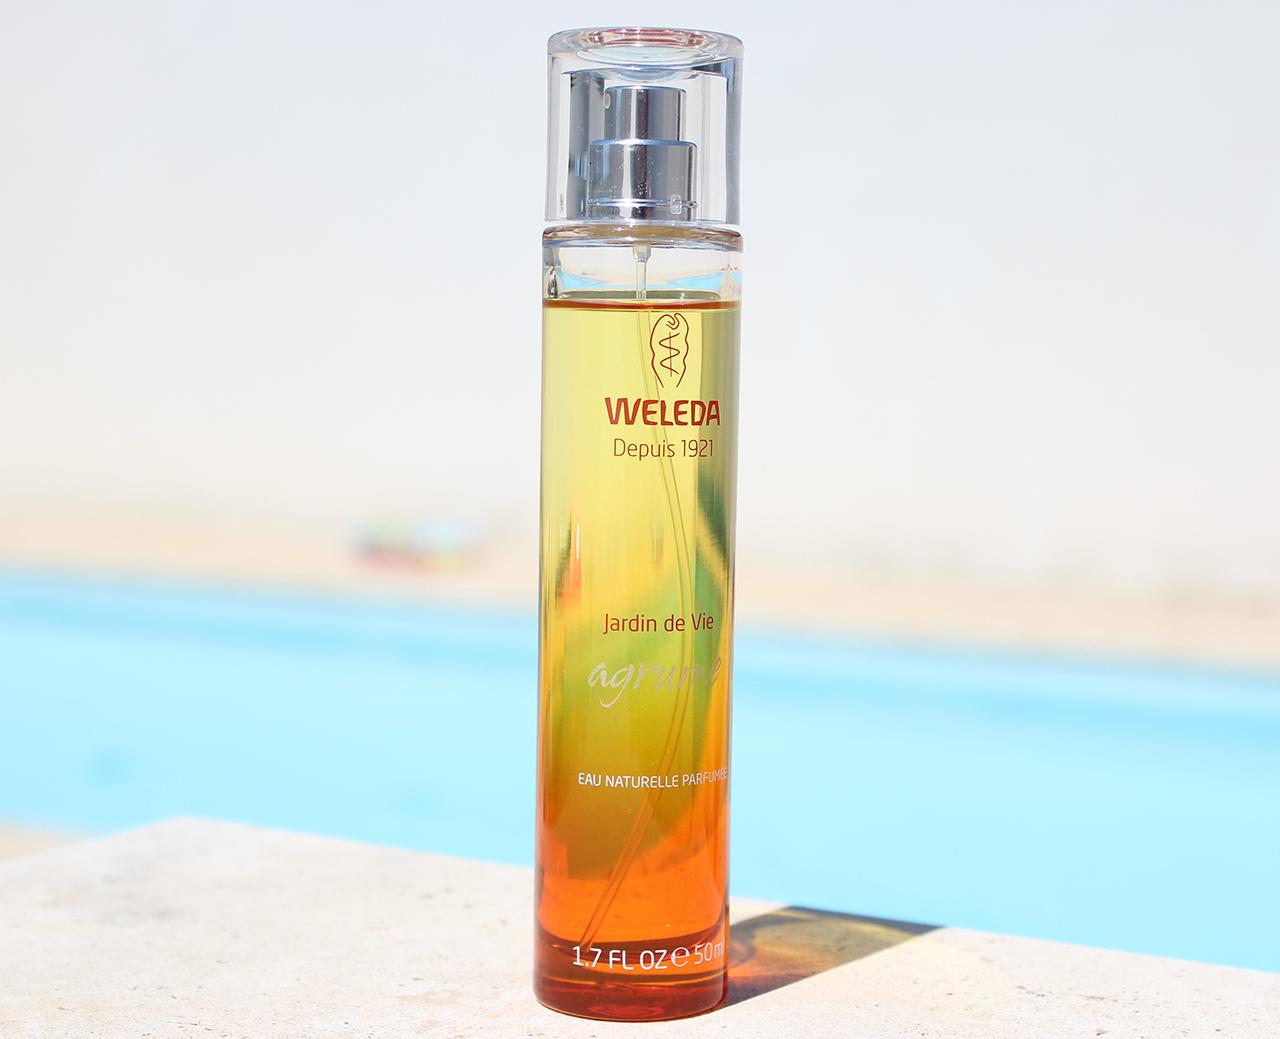 Jardin de Vie parfum Agrume Weleda